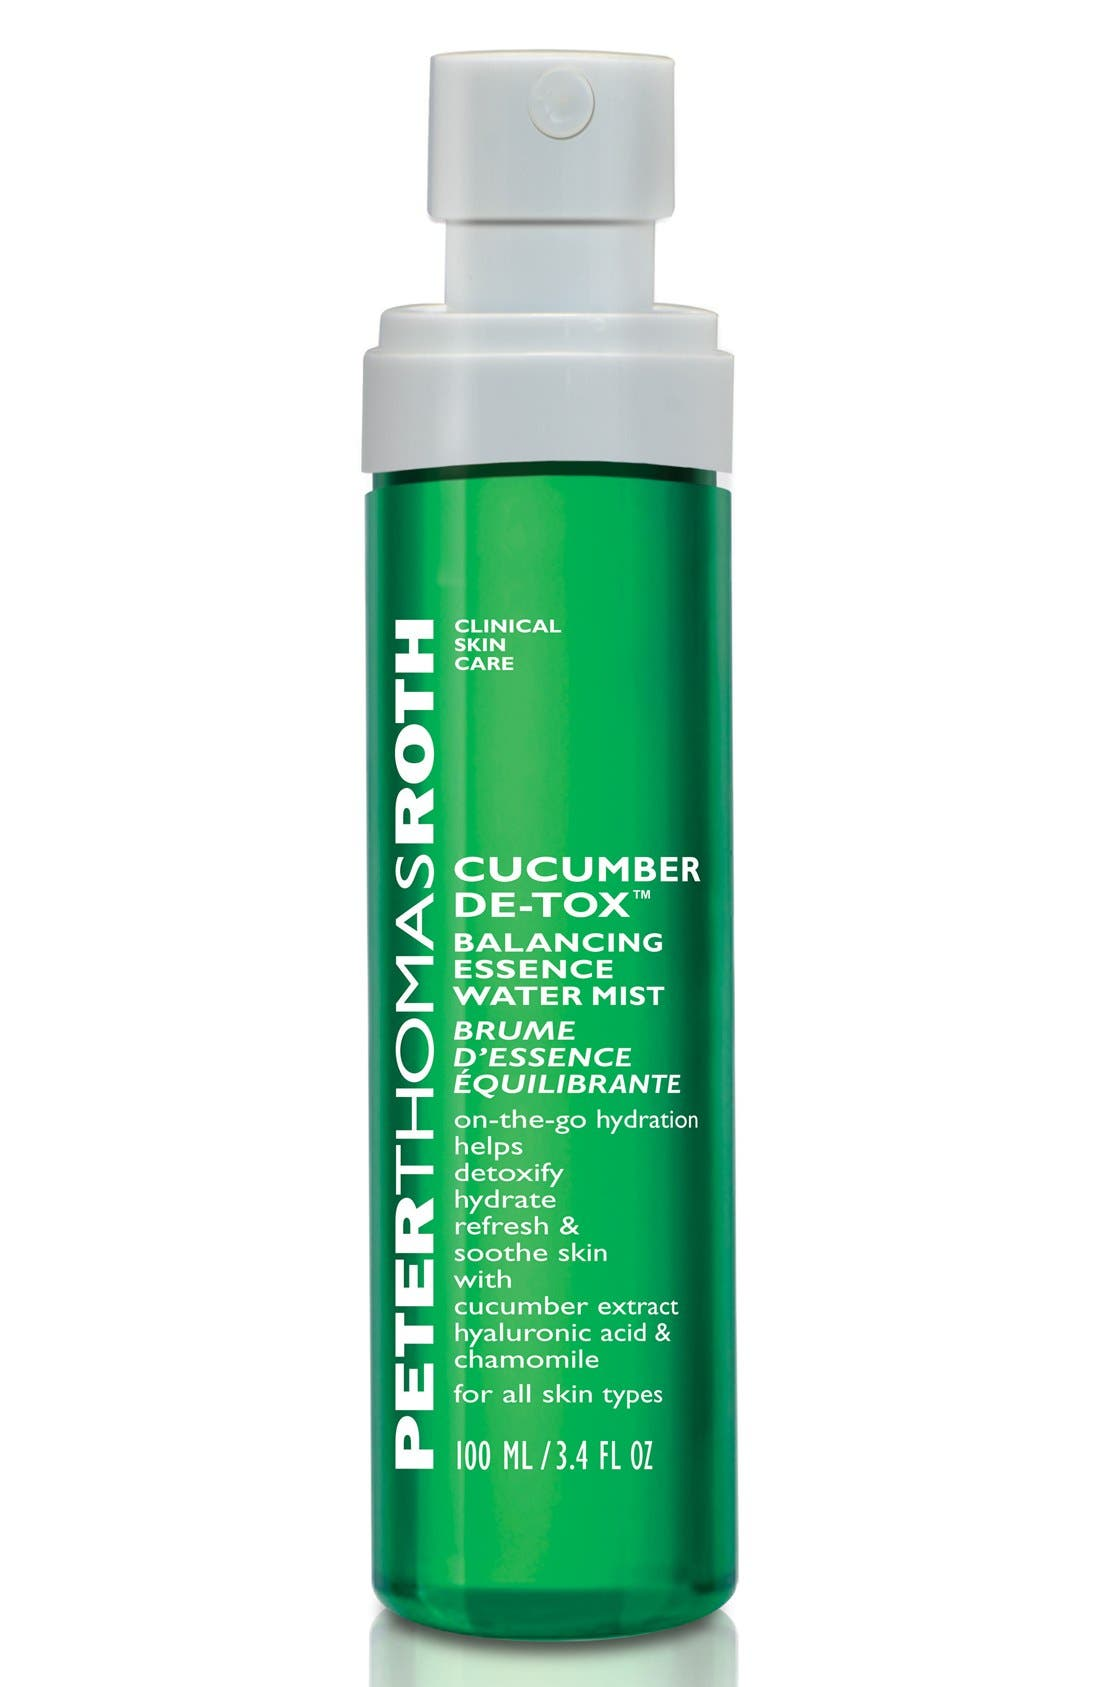 Peter Thomas Roth Cucumber De-Tox™ Balancing Esscence Water Mist